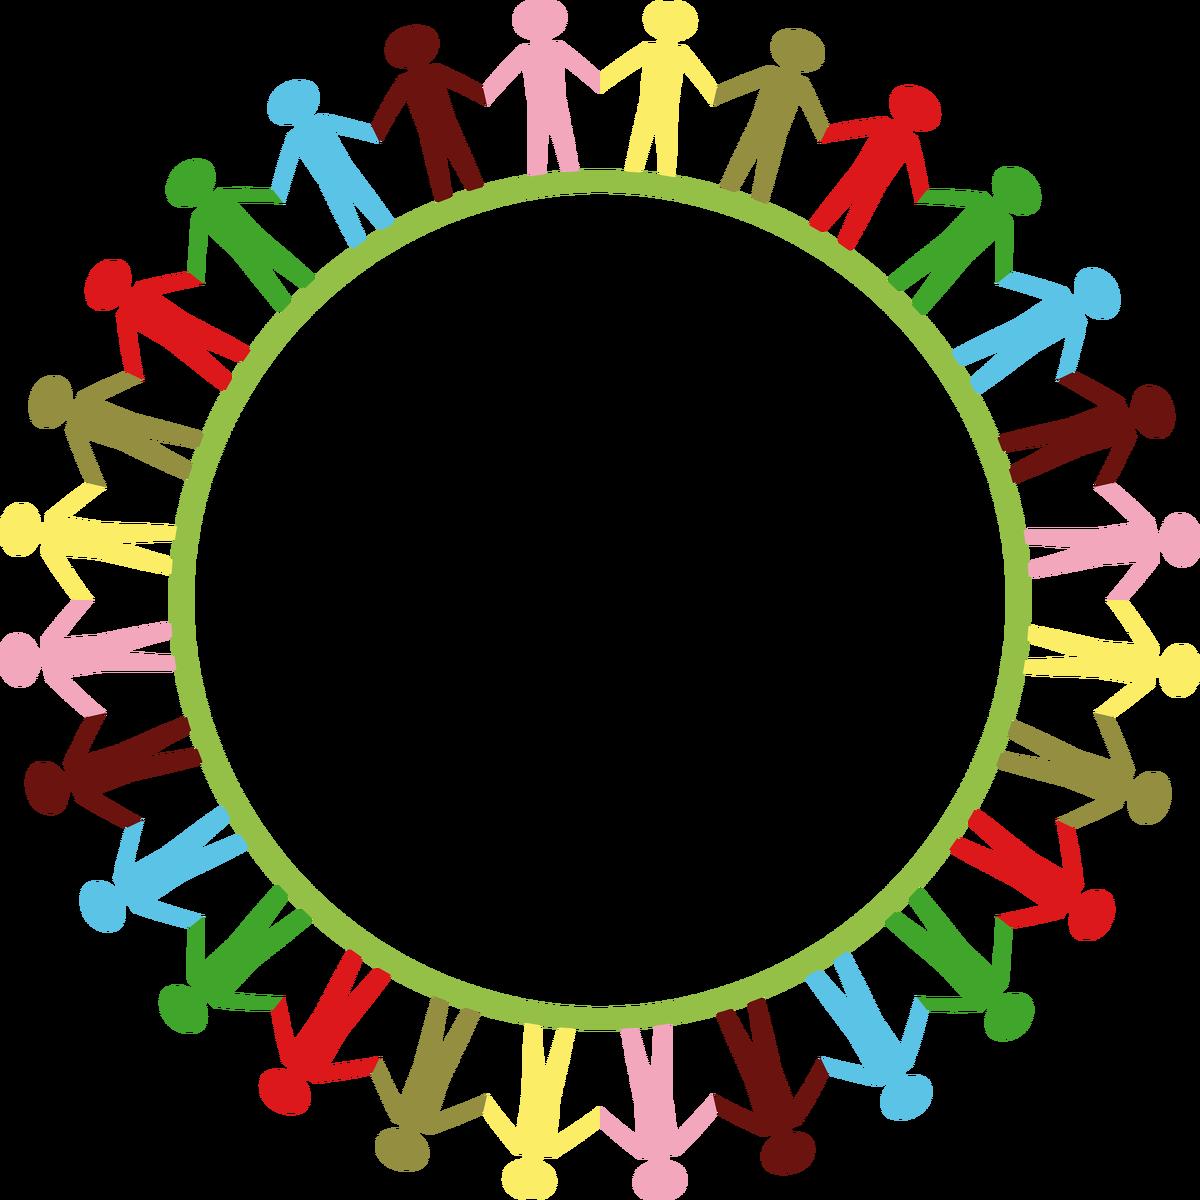 multiculturalism-2.png